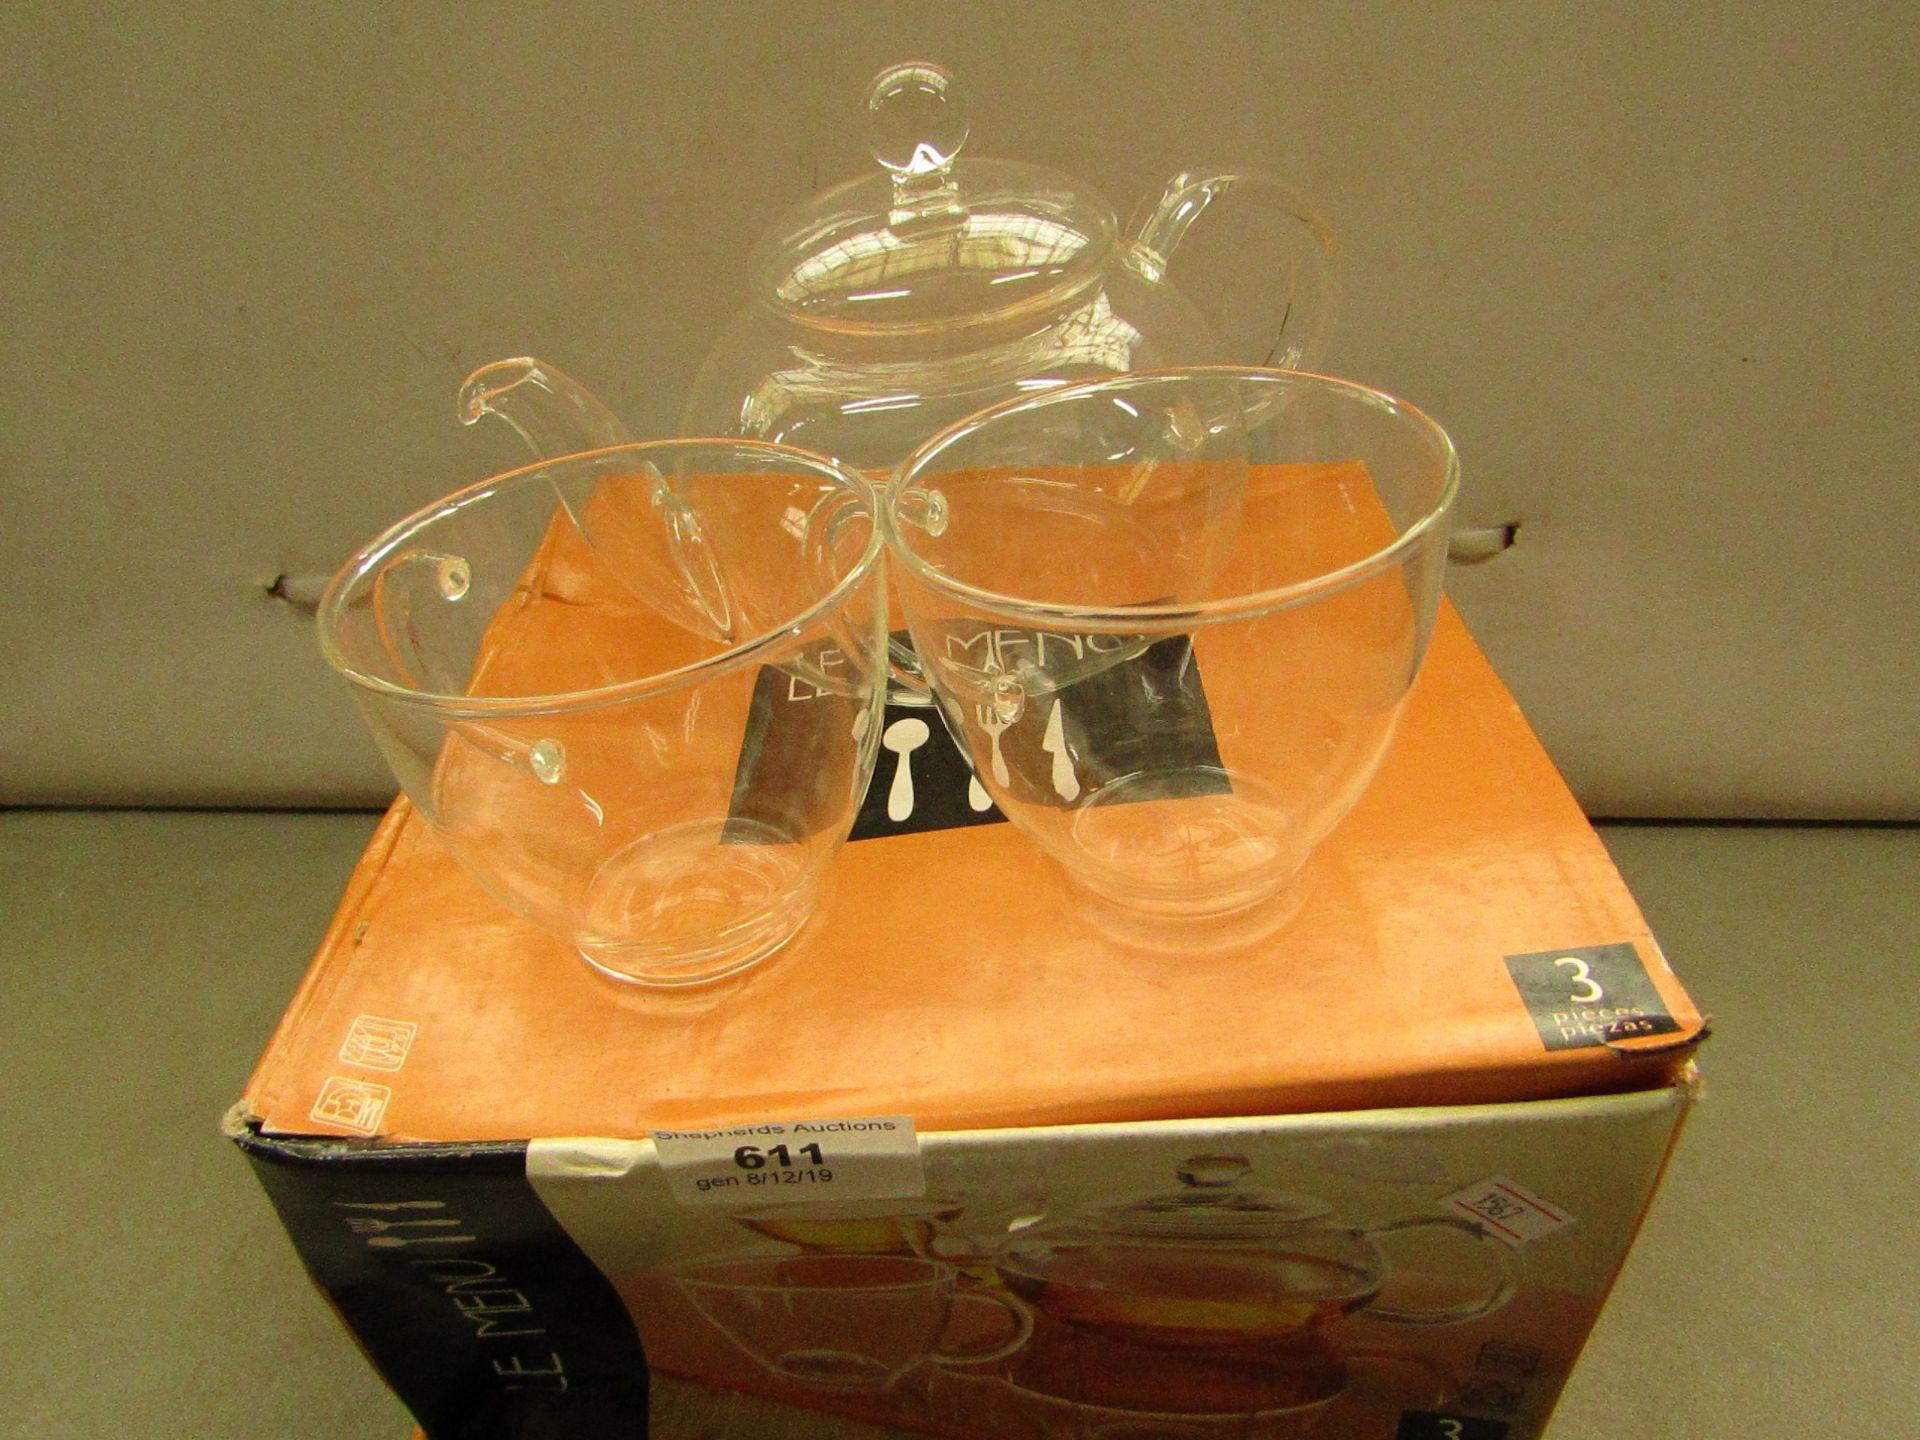 Lot 611 - Glass tea Pot & 2 Glass Cups Boxed